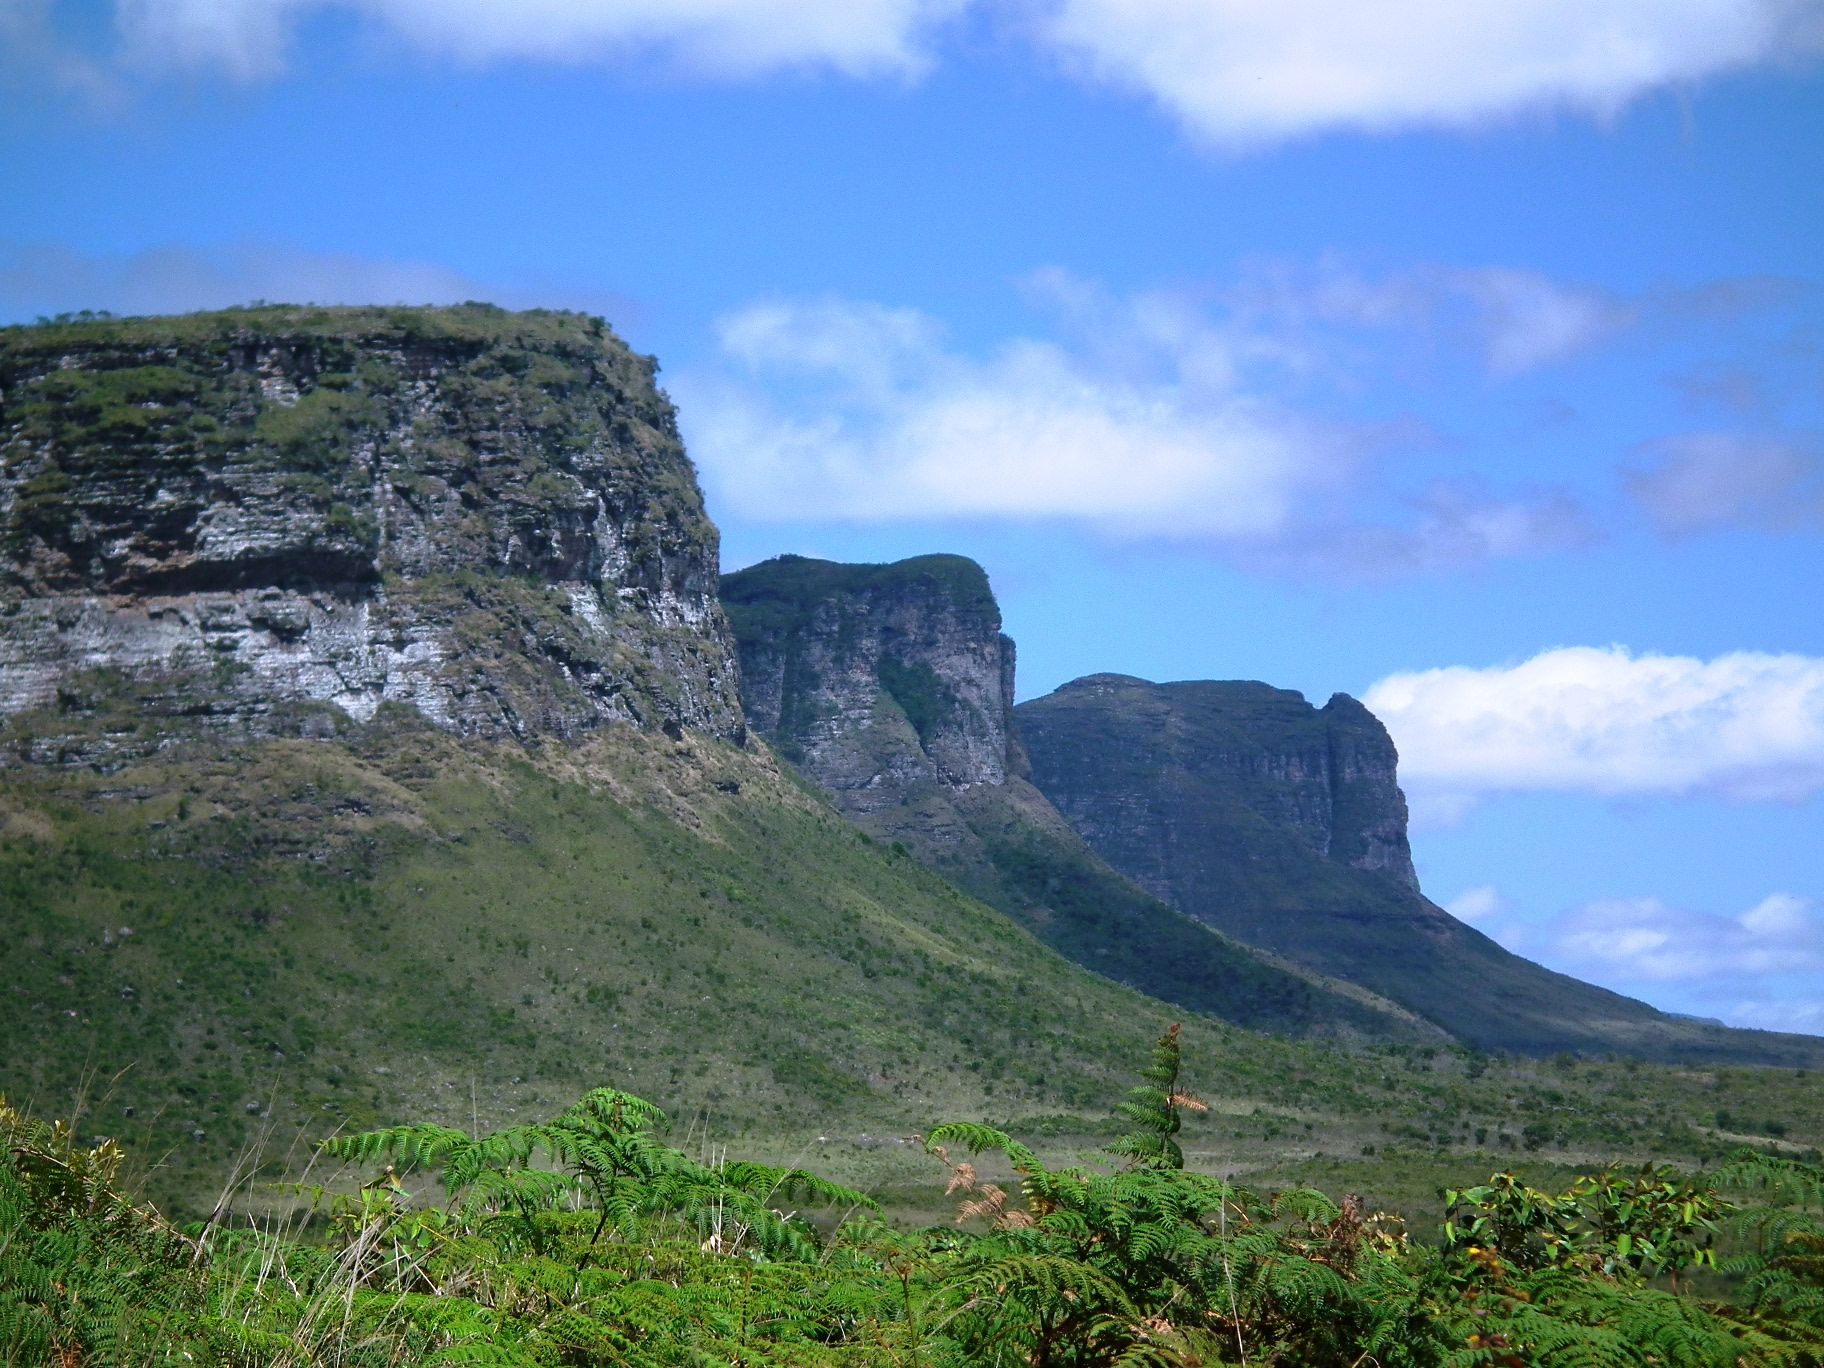 Admire Scenic Views of Cliffs